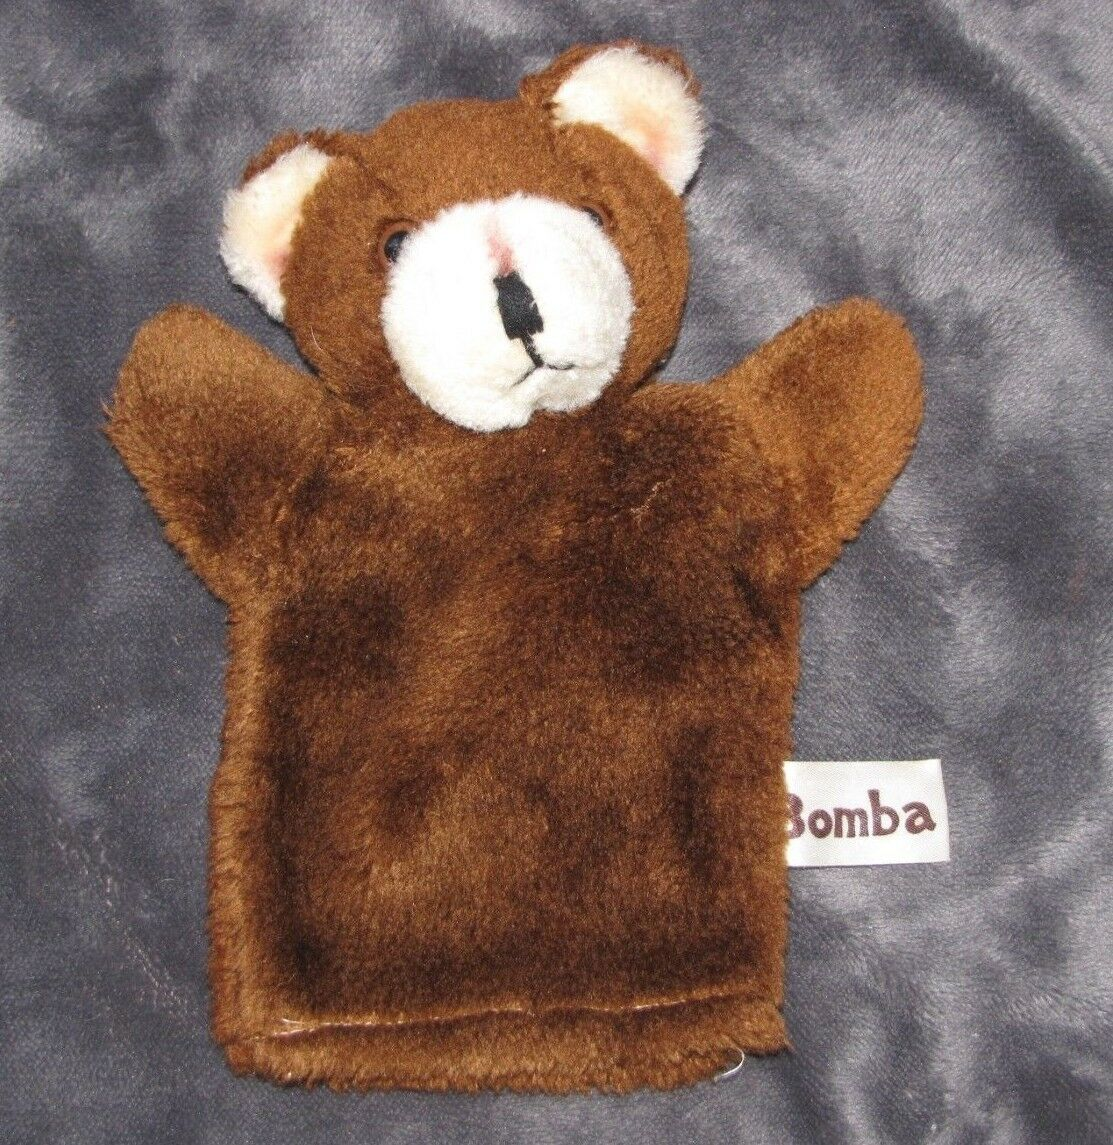 VINTAGE 1977 RUSS BERRIE & AND CO STUFFED PLUSH braun TEDDY BEAR PUPPET BOMBA